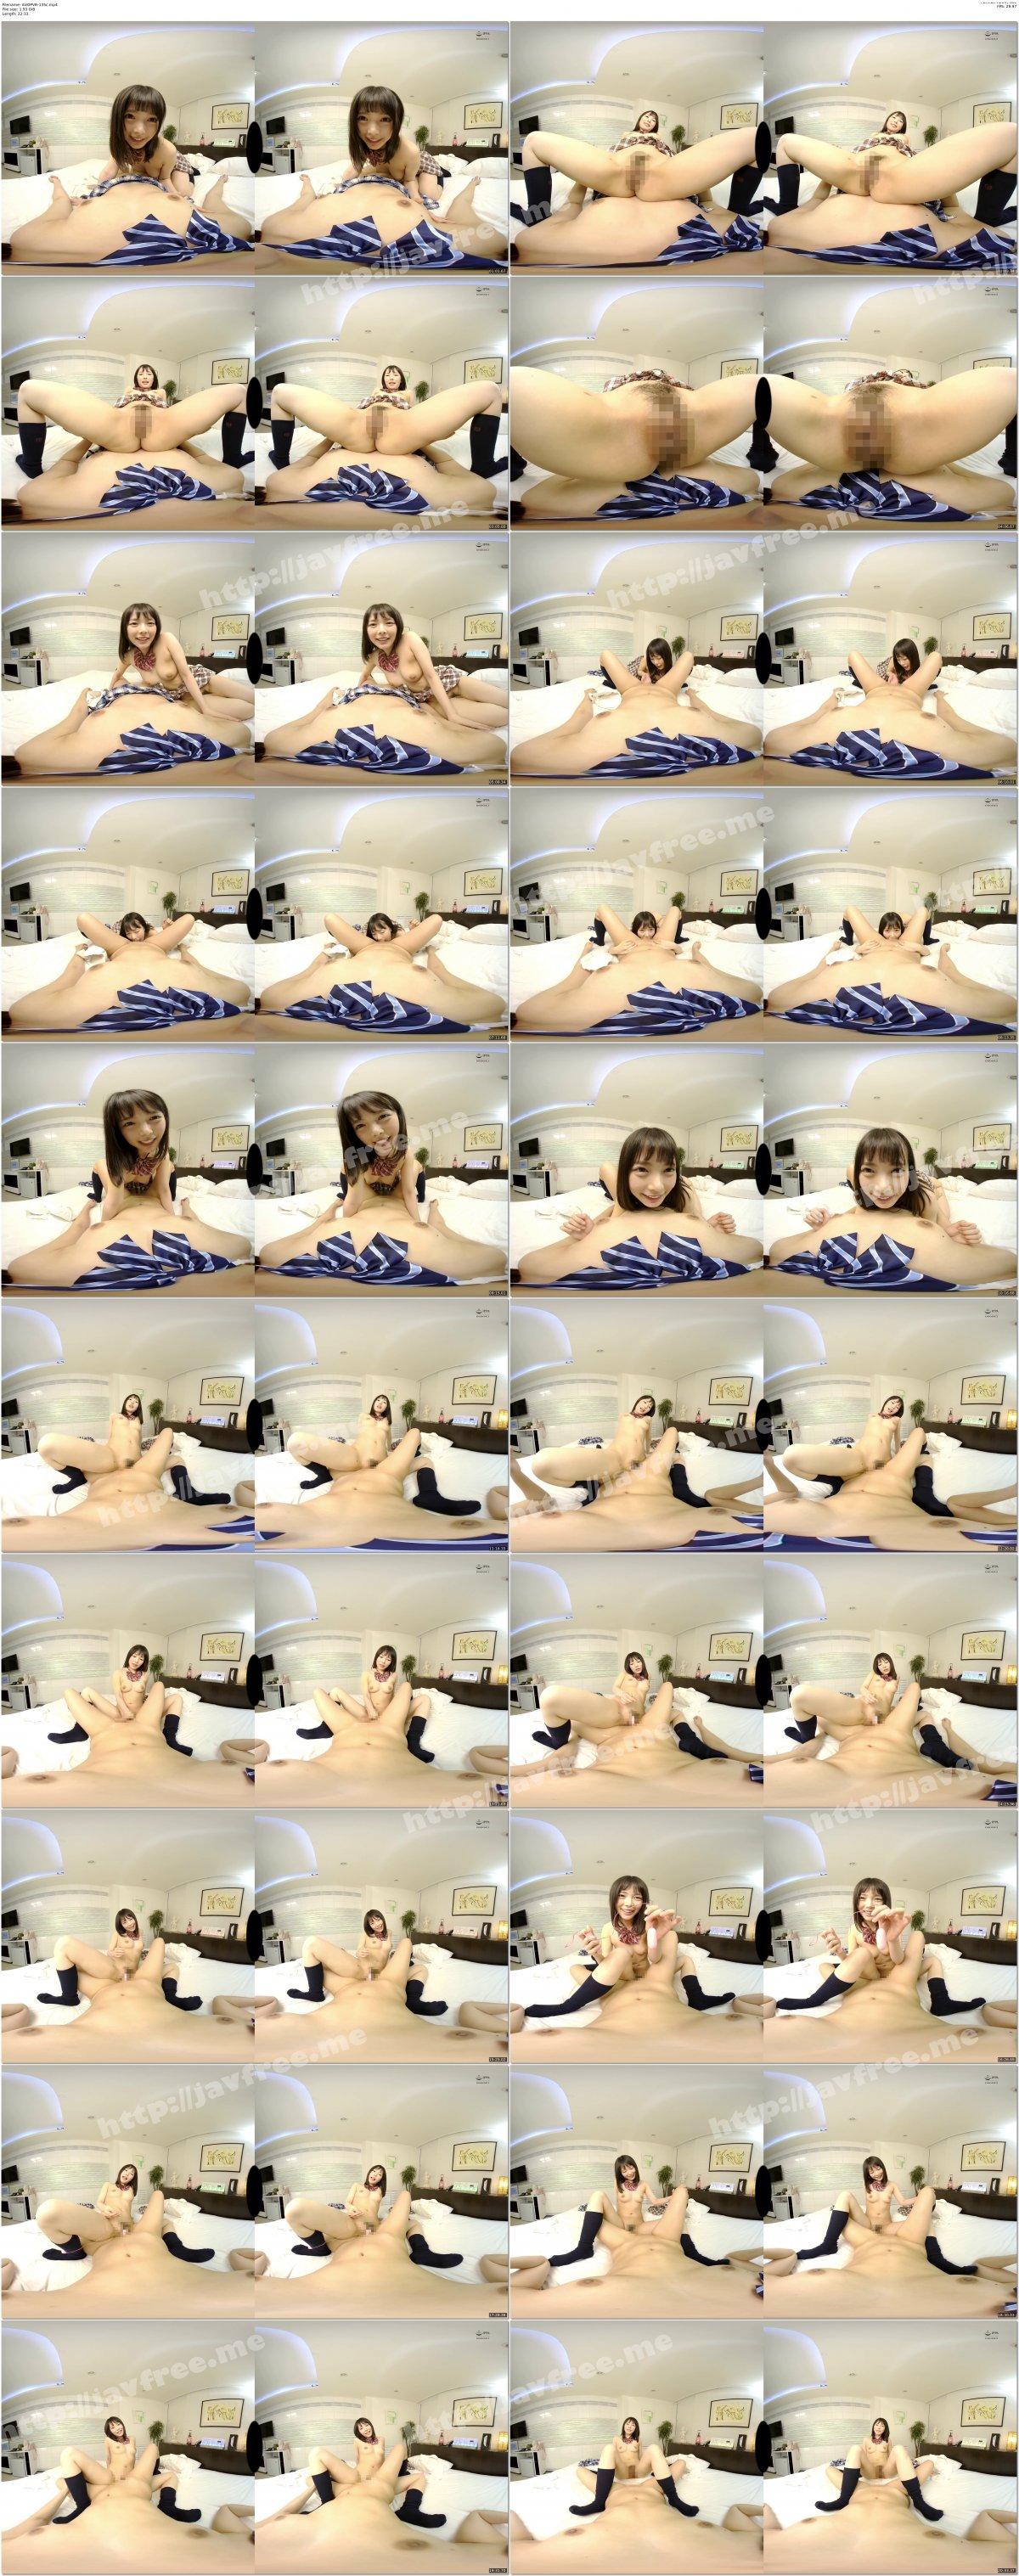 [AVOPVR-135] 【VR】レズ風俗 VR【視点移動×固定視点】で女の子になって、レズ風俗で責められまくって女子のイクを体感できたり制服プレイを楽しめる超高画質 VR - image AVOPVR-135c on https://javfree.me